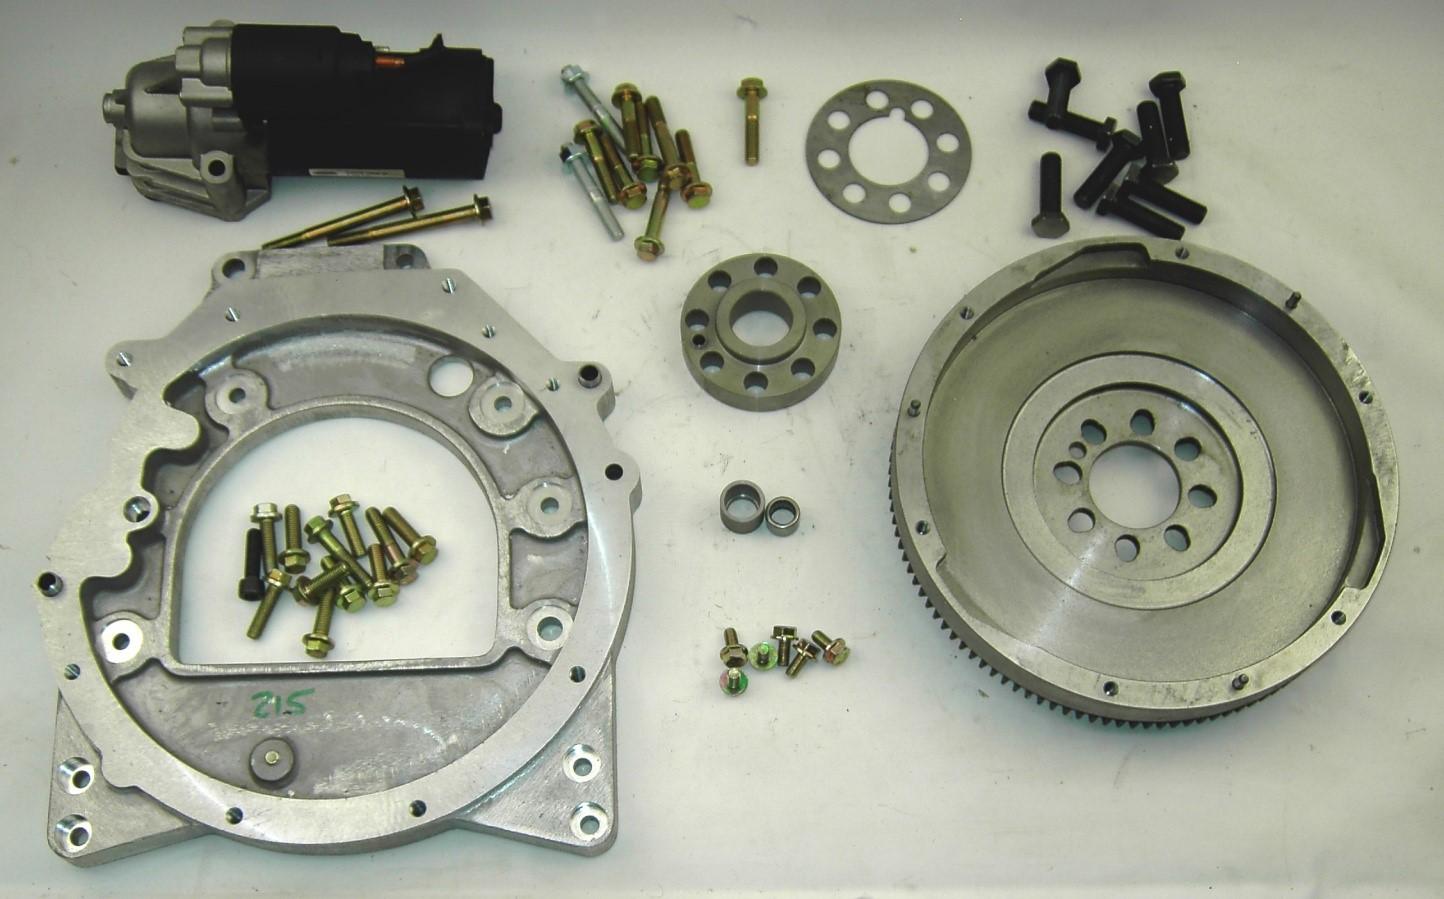 Kit 215, LR 300Tdi engine to 6 speed MT82 gearbox